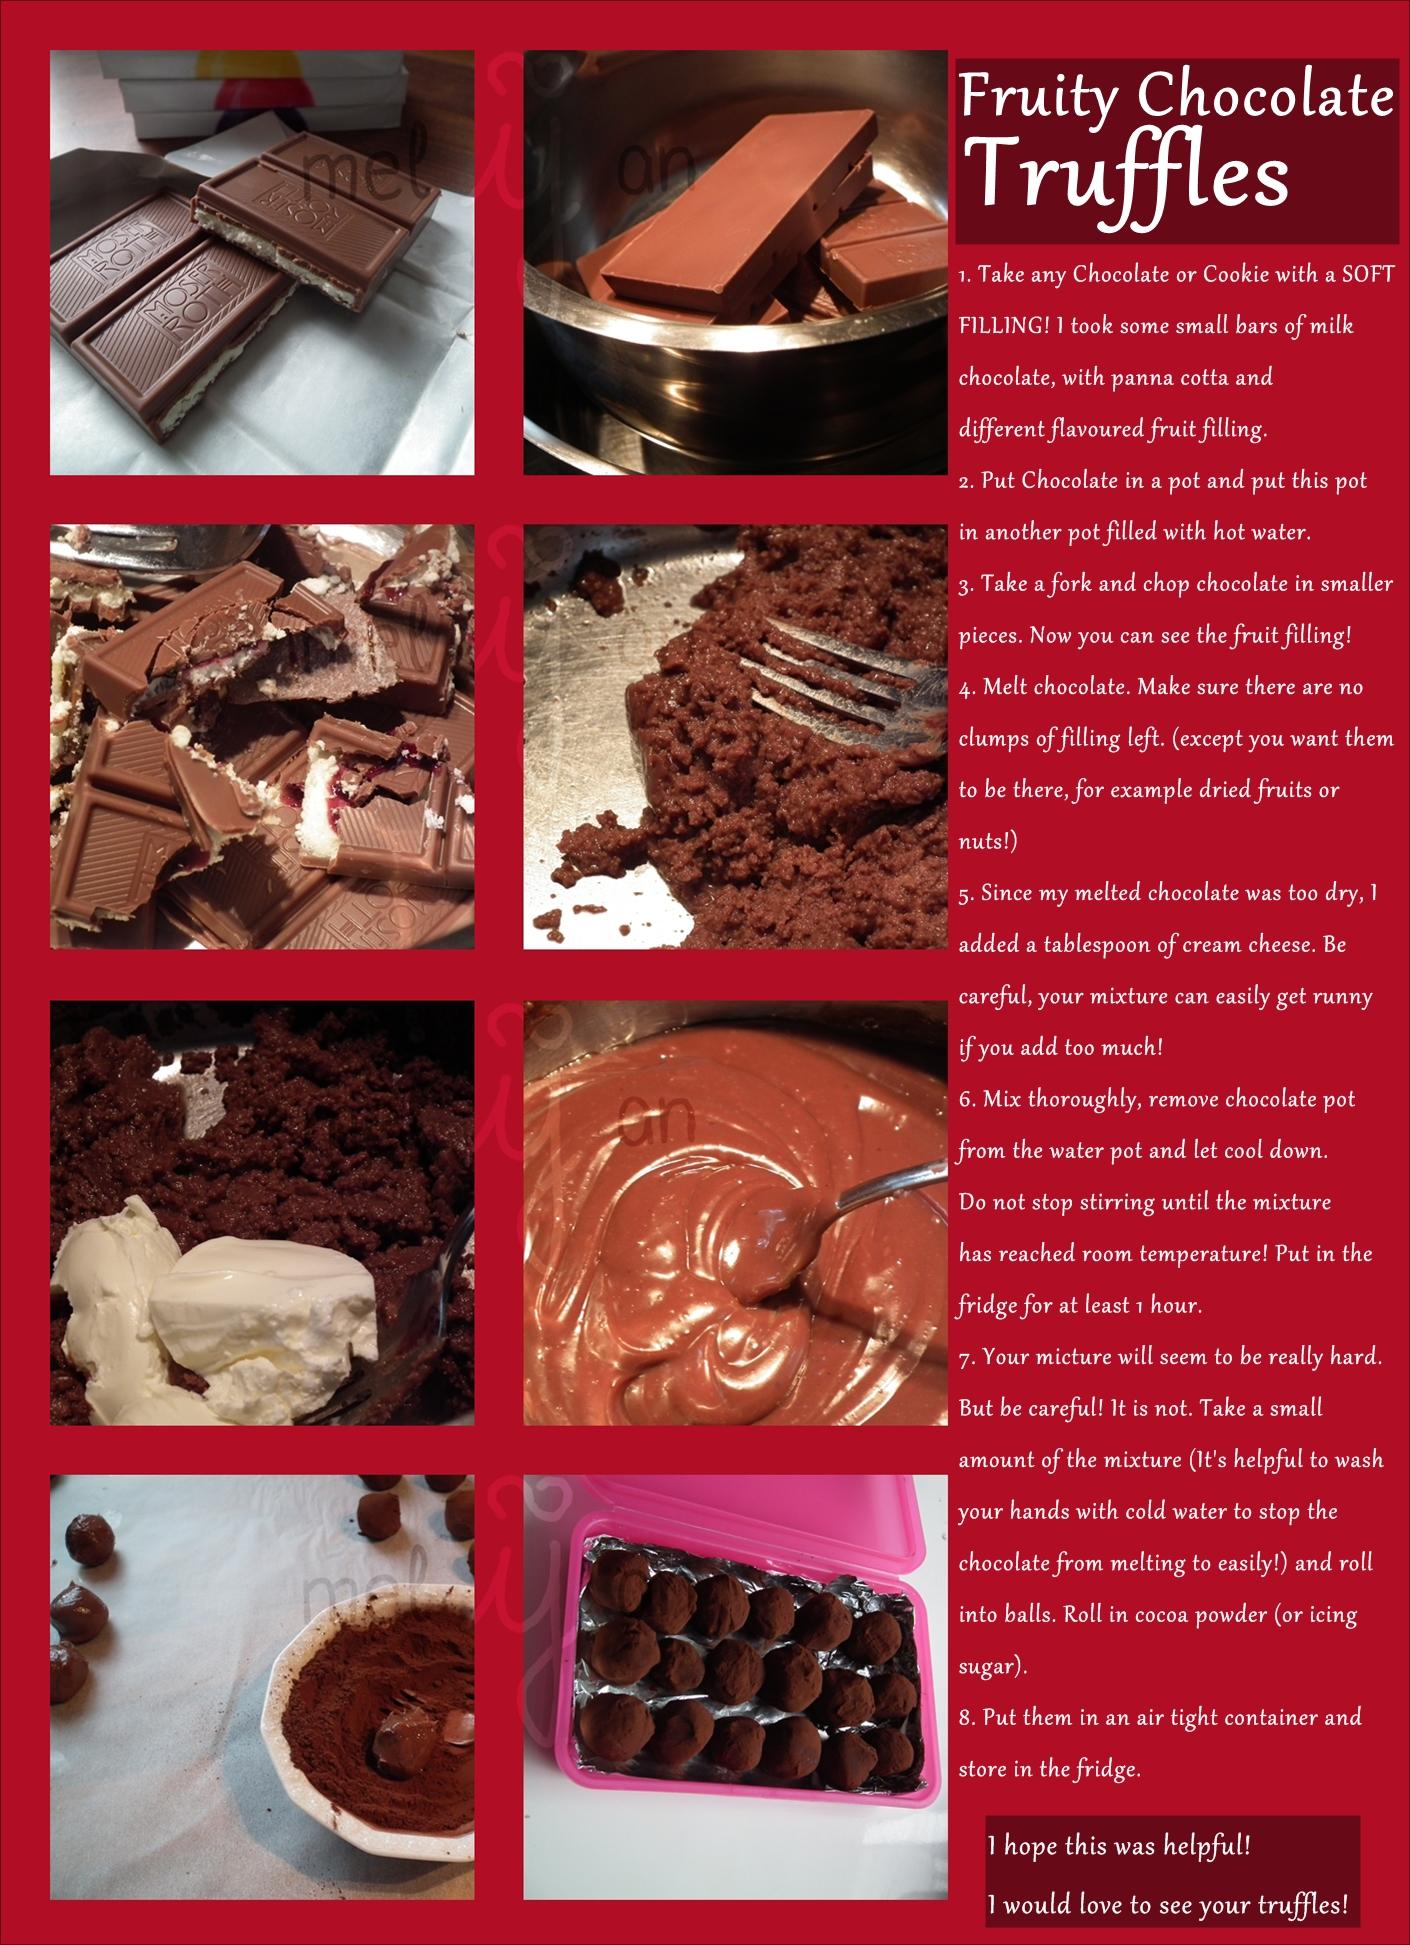 Fruity Chocolate Truffles Recipe by melijan